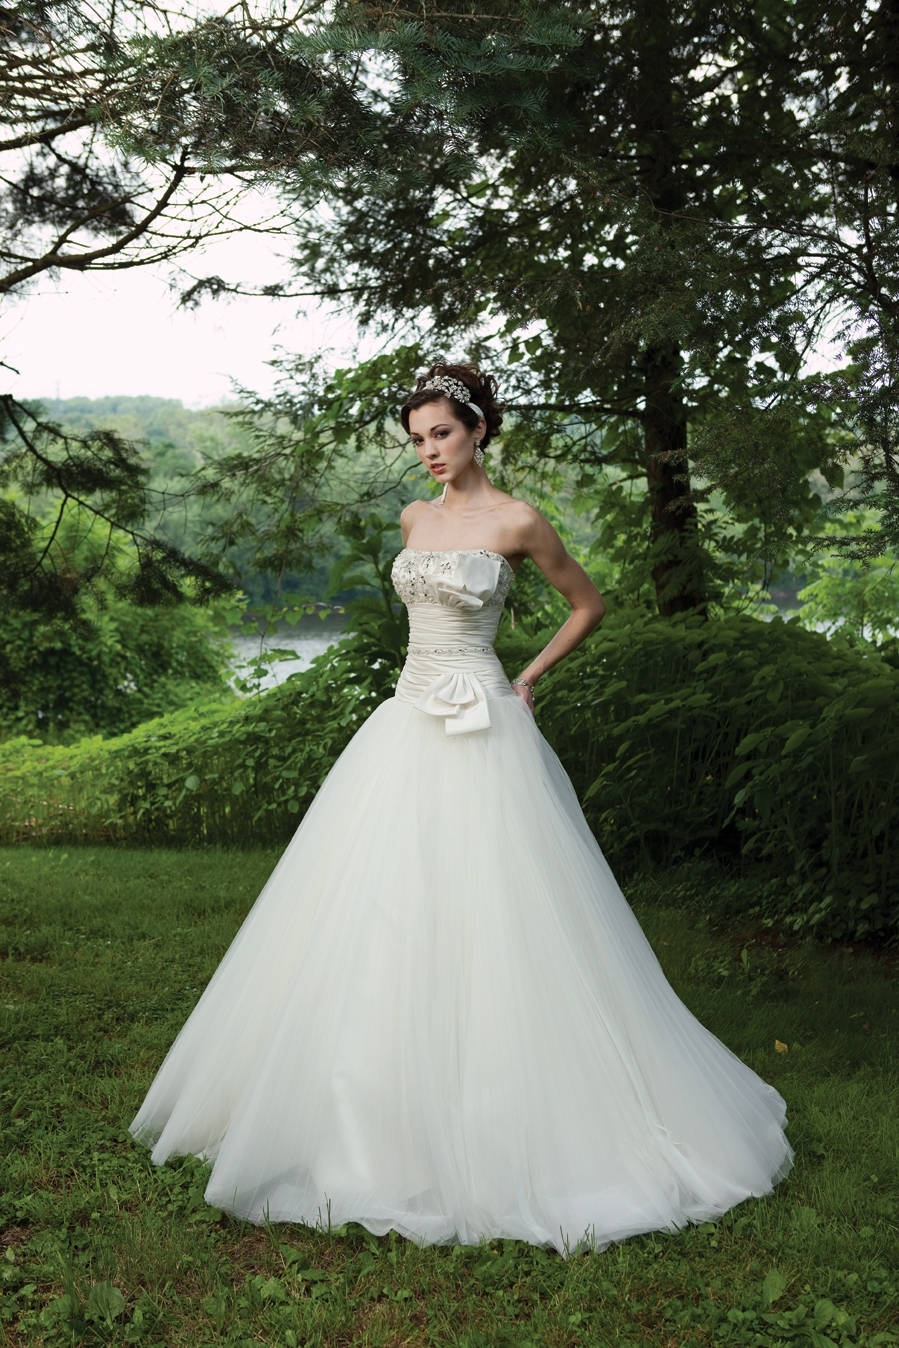 G231118-spring-2011-2bebride-wedding-dress-kathy-ireland-front.full